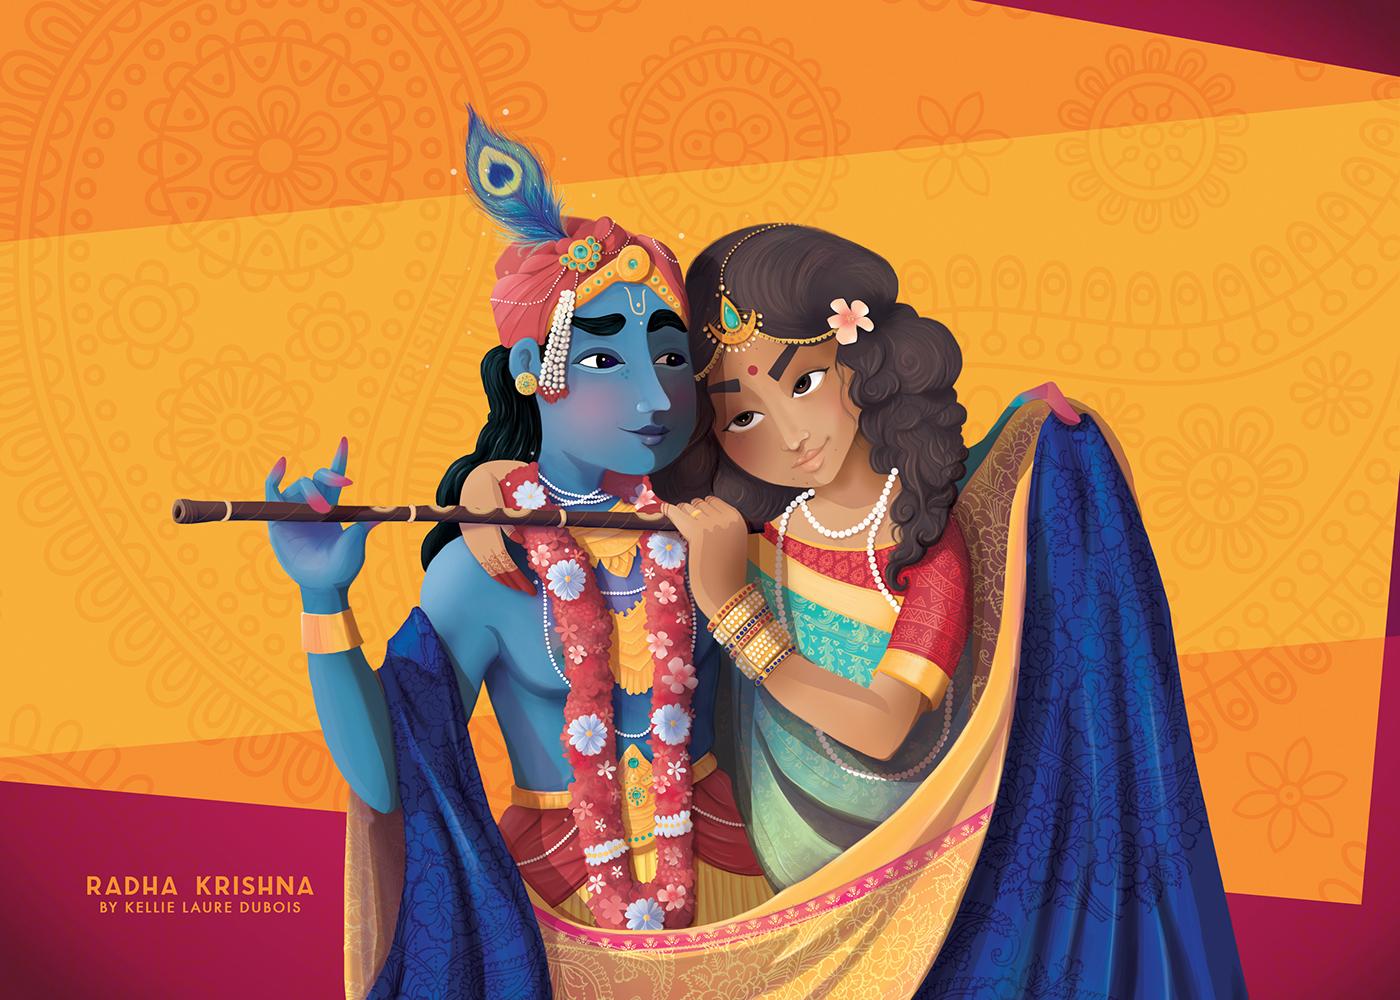 India krishna Radha hindou Diwali saint valentin colors religion story hale